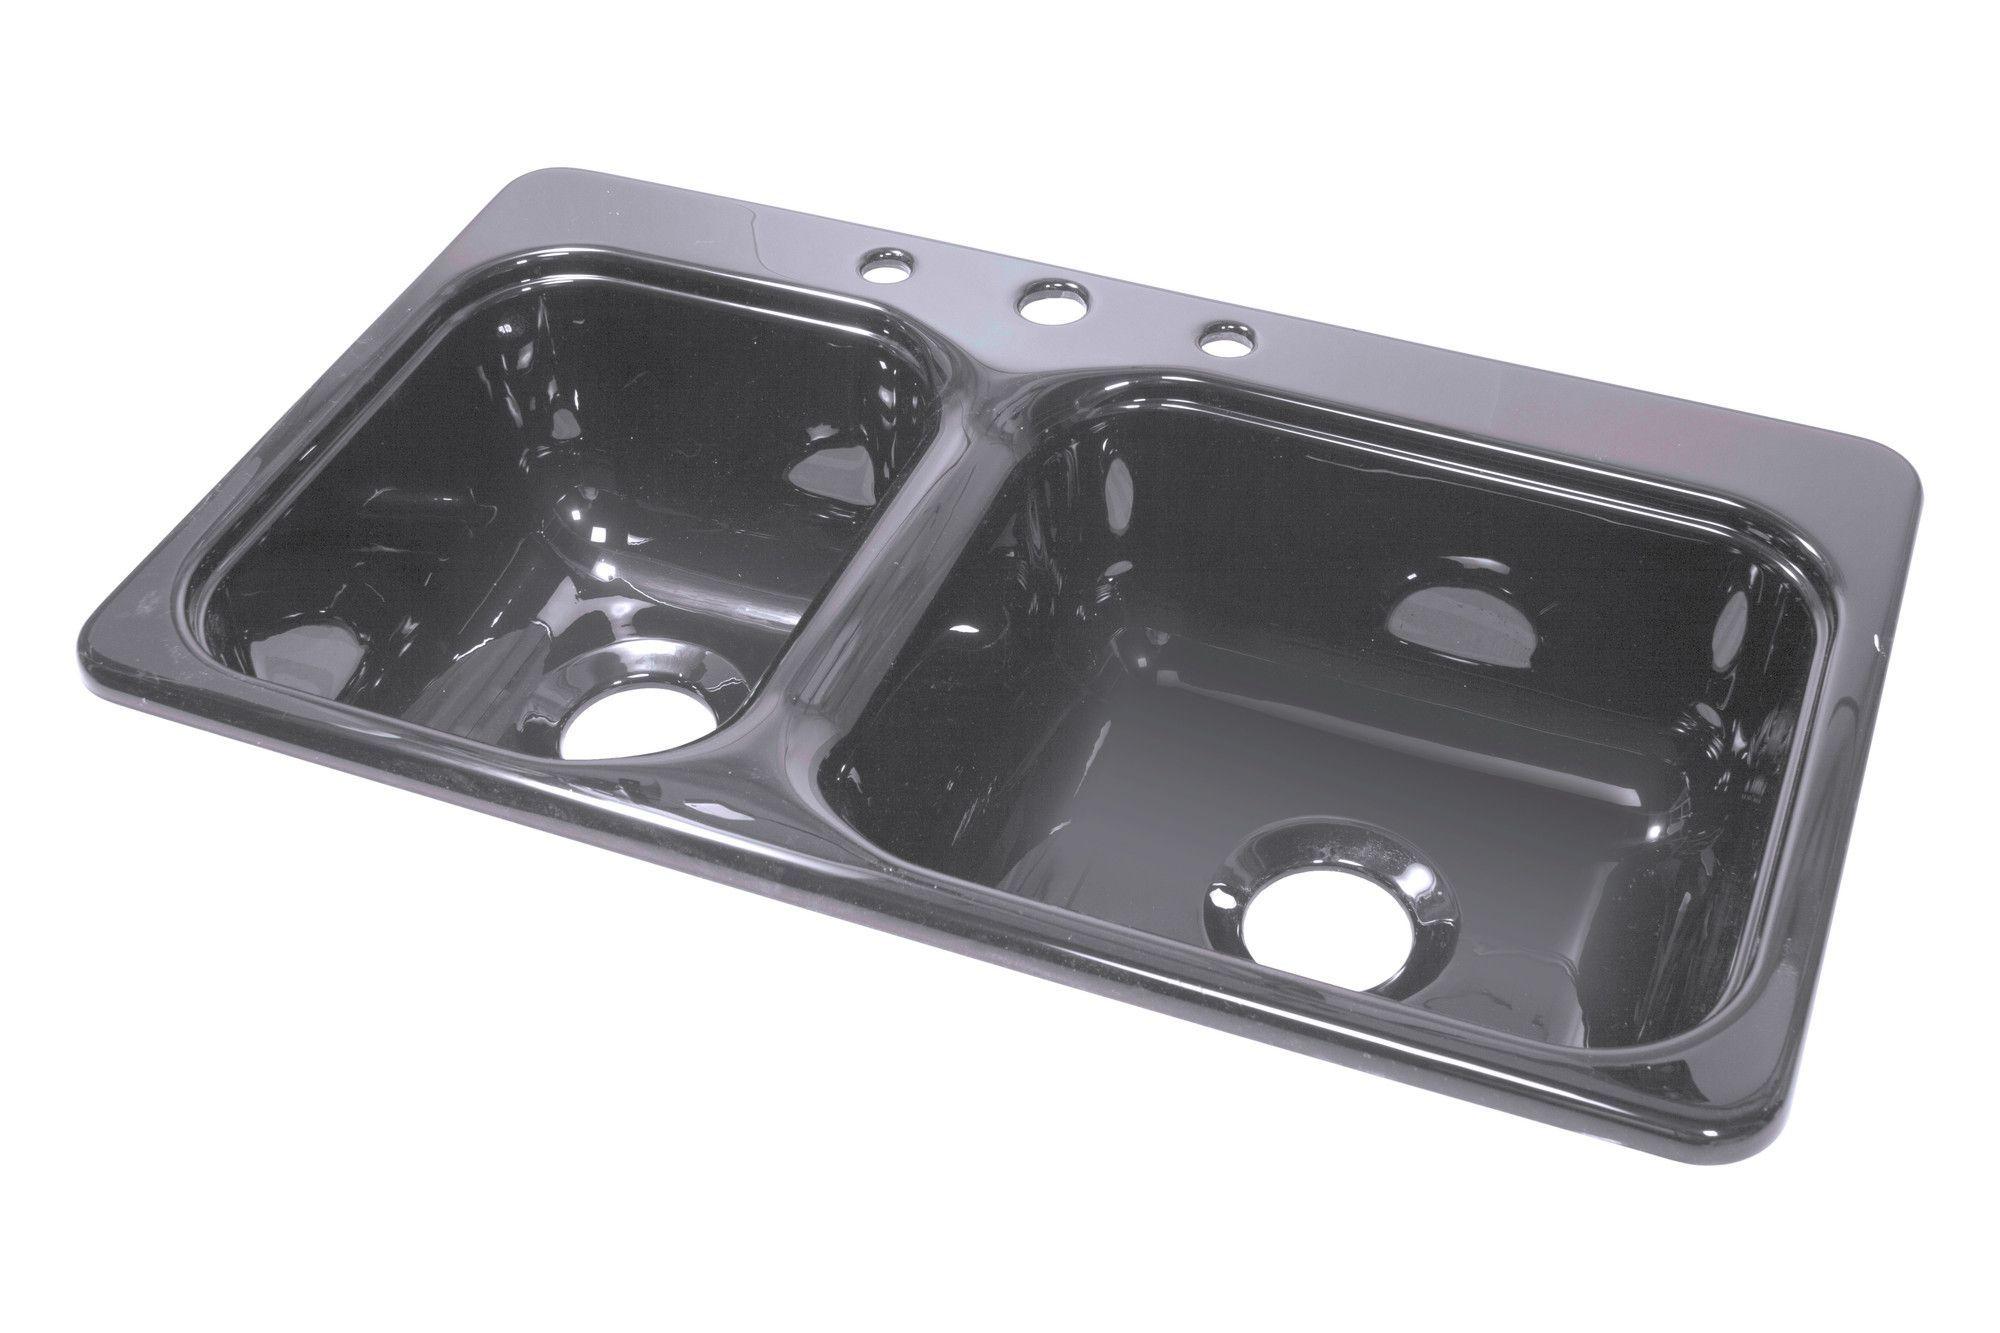 hahn kitchen sinks Elkay Gourmet 43 22 Self Rimming Single Bowl Kitchen Sink